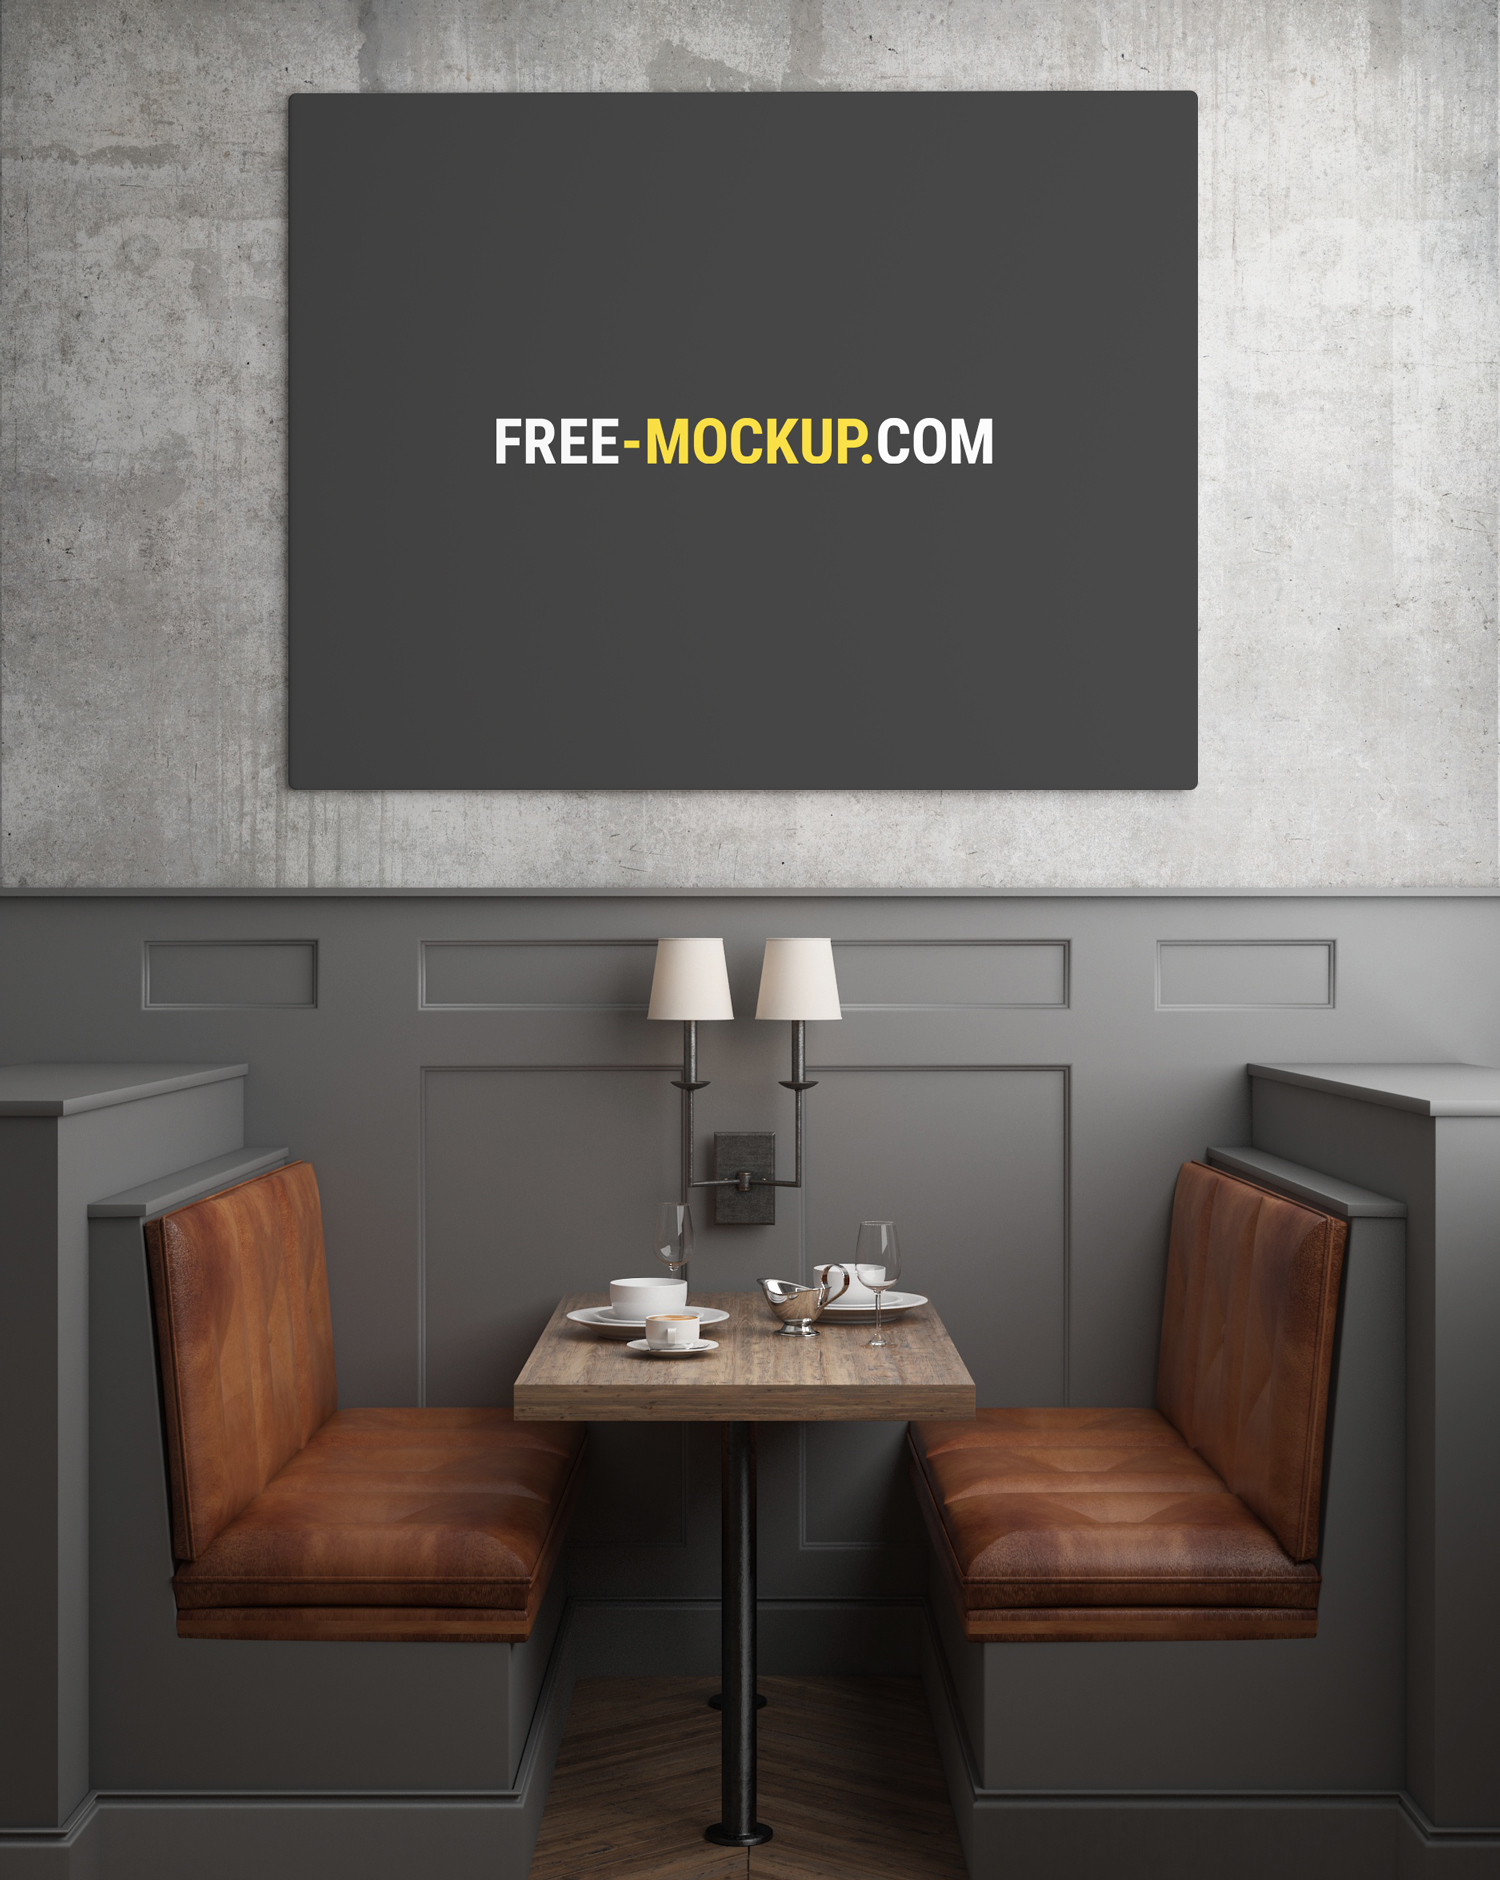 Restaurant Poster Painting Mockup Free Mockup